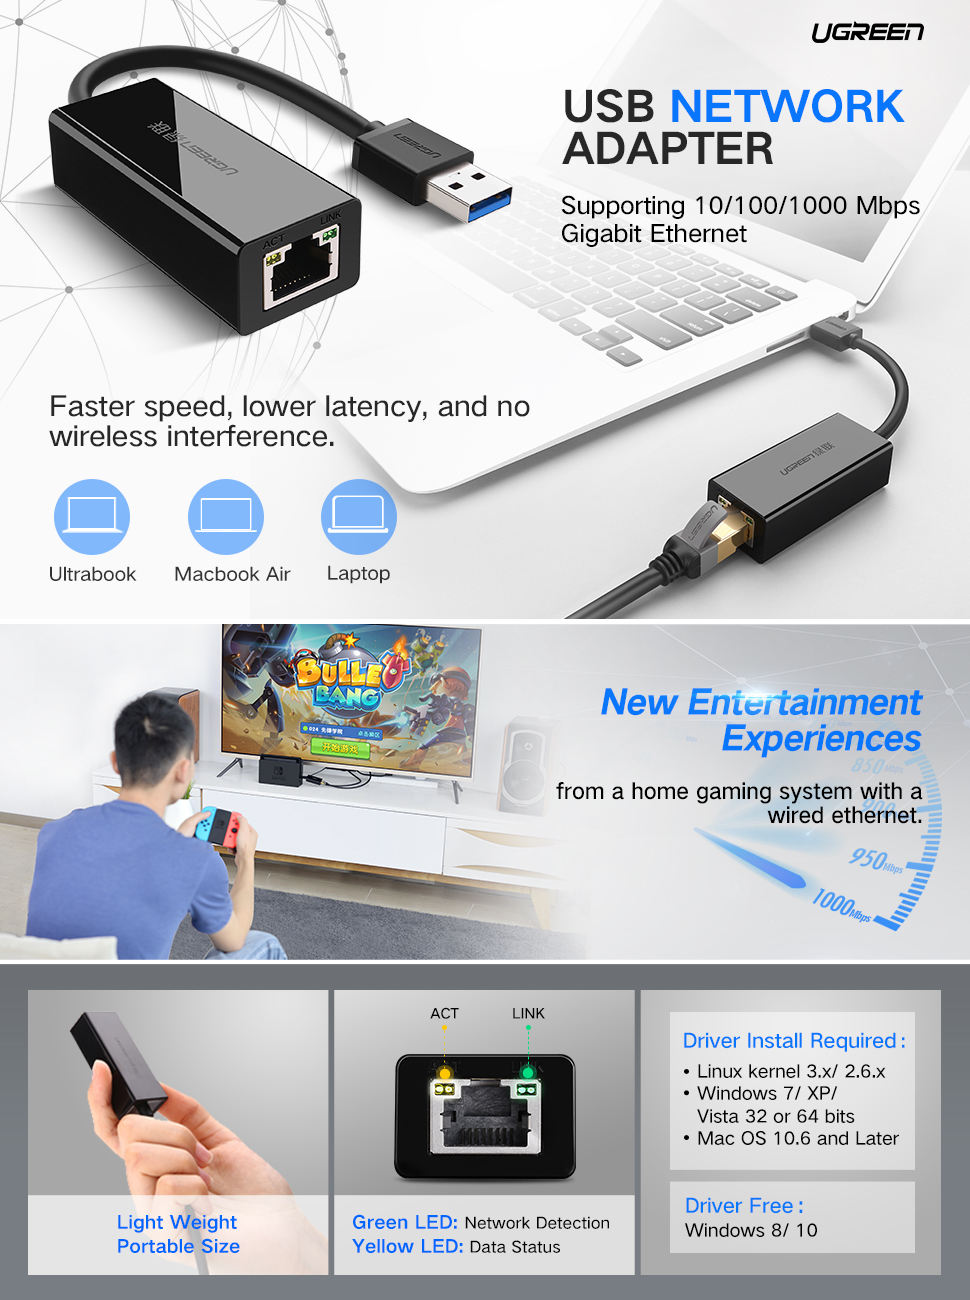 Ugreen Network Adapter Usb 30 To Ethernet Rj45 Lan Rj5 Wiring Diagram Gigabit For Nintendo Switch